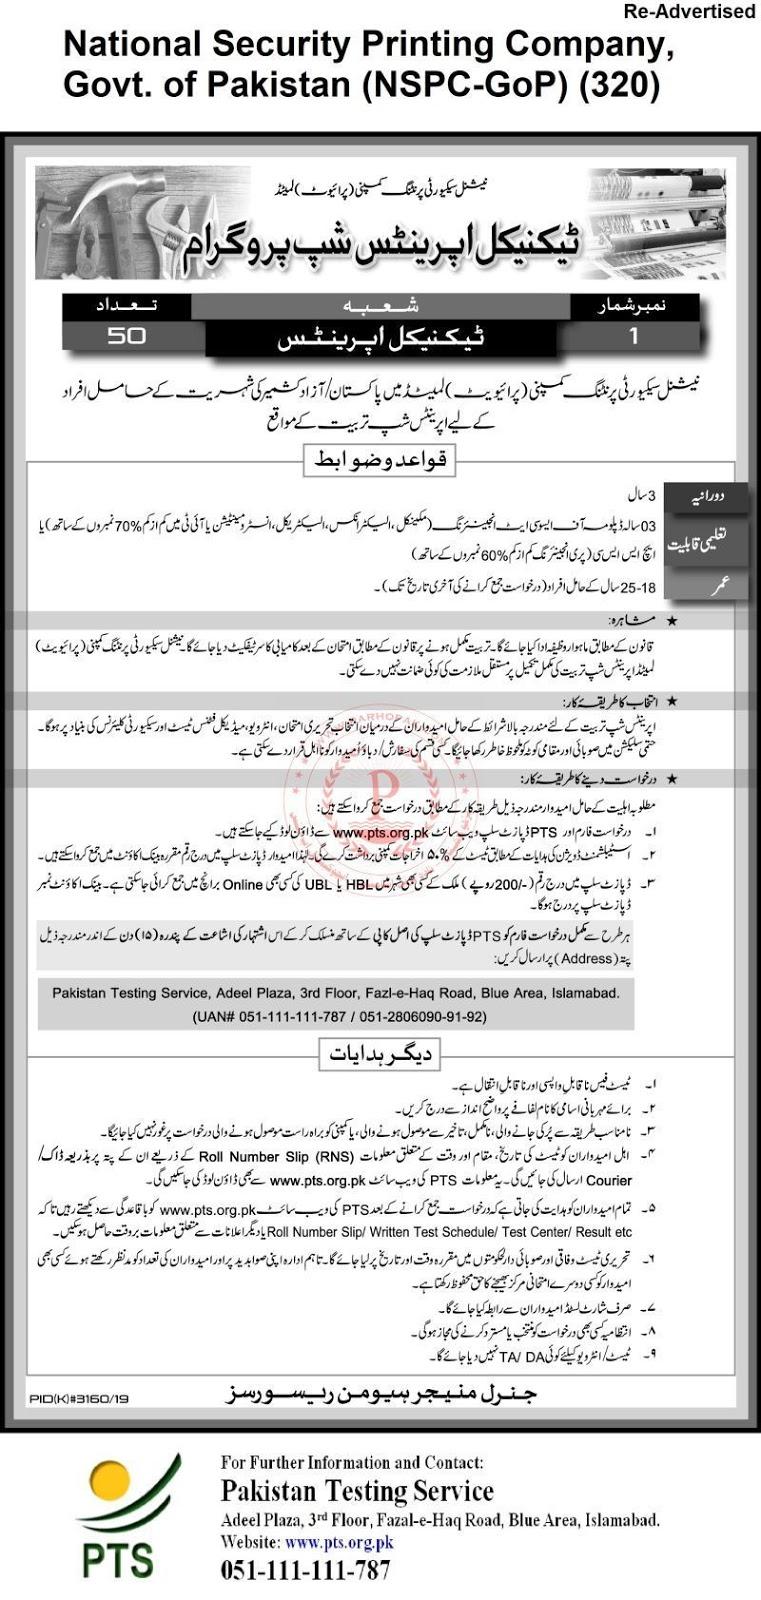 National Security Printing Company Apprenticeship Program 2020